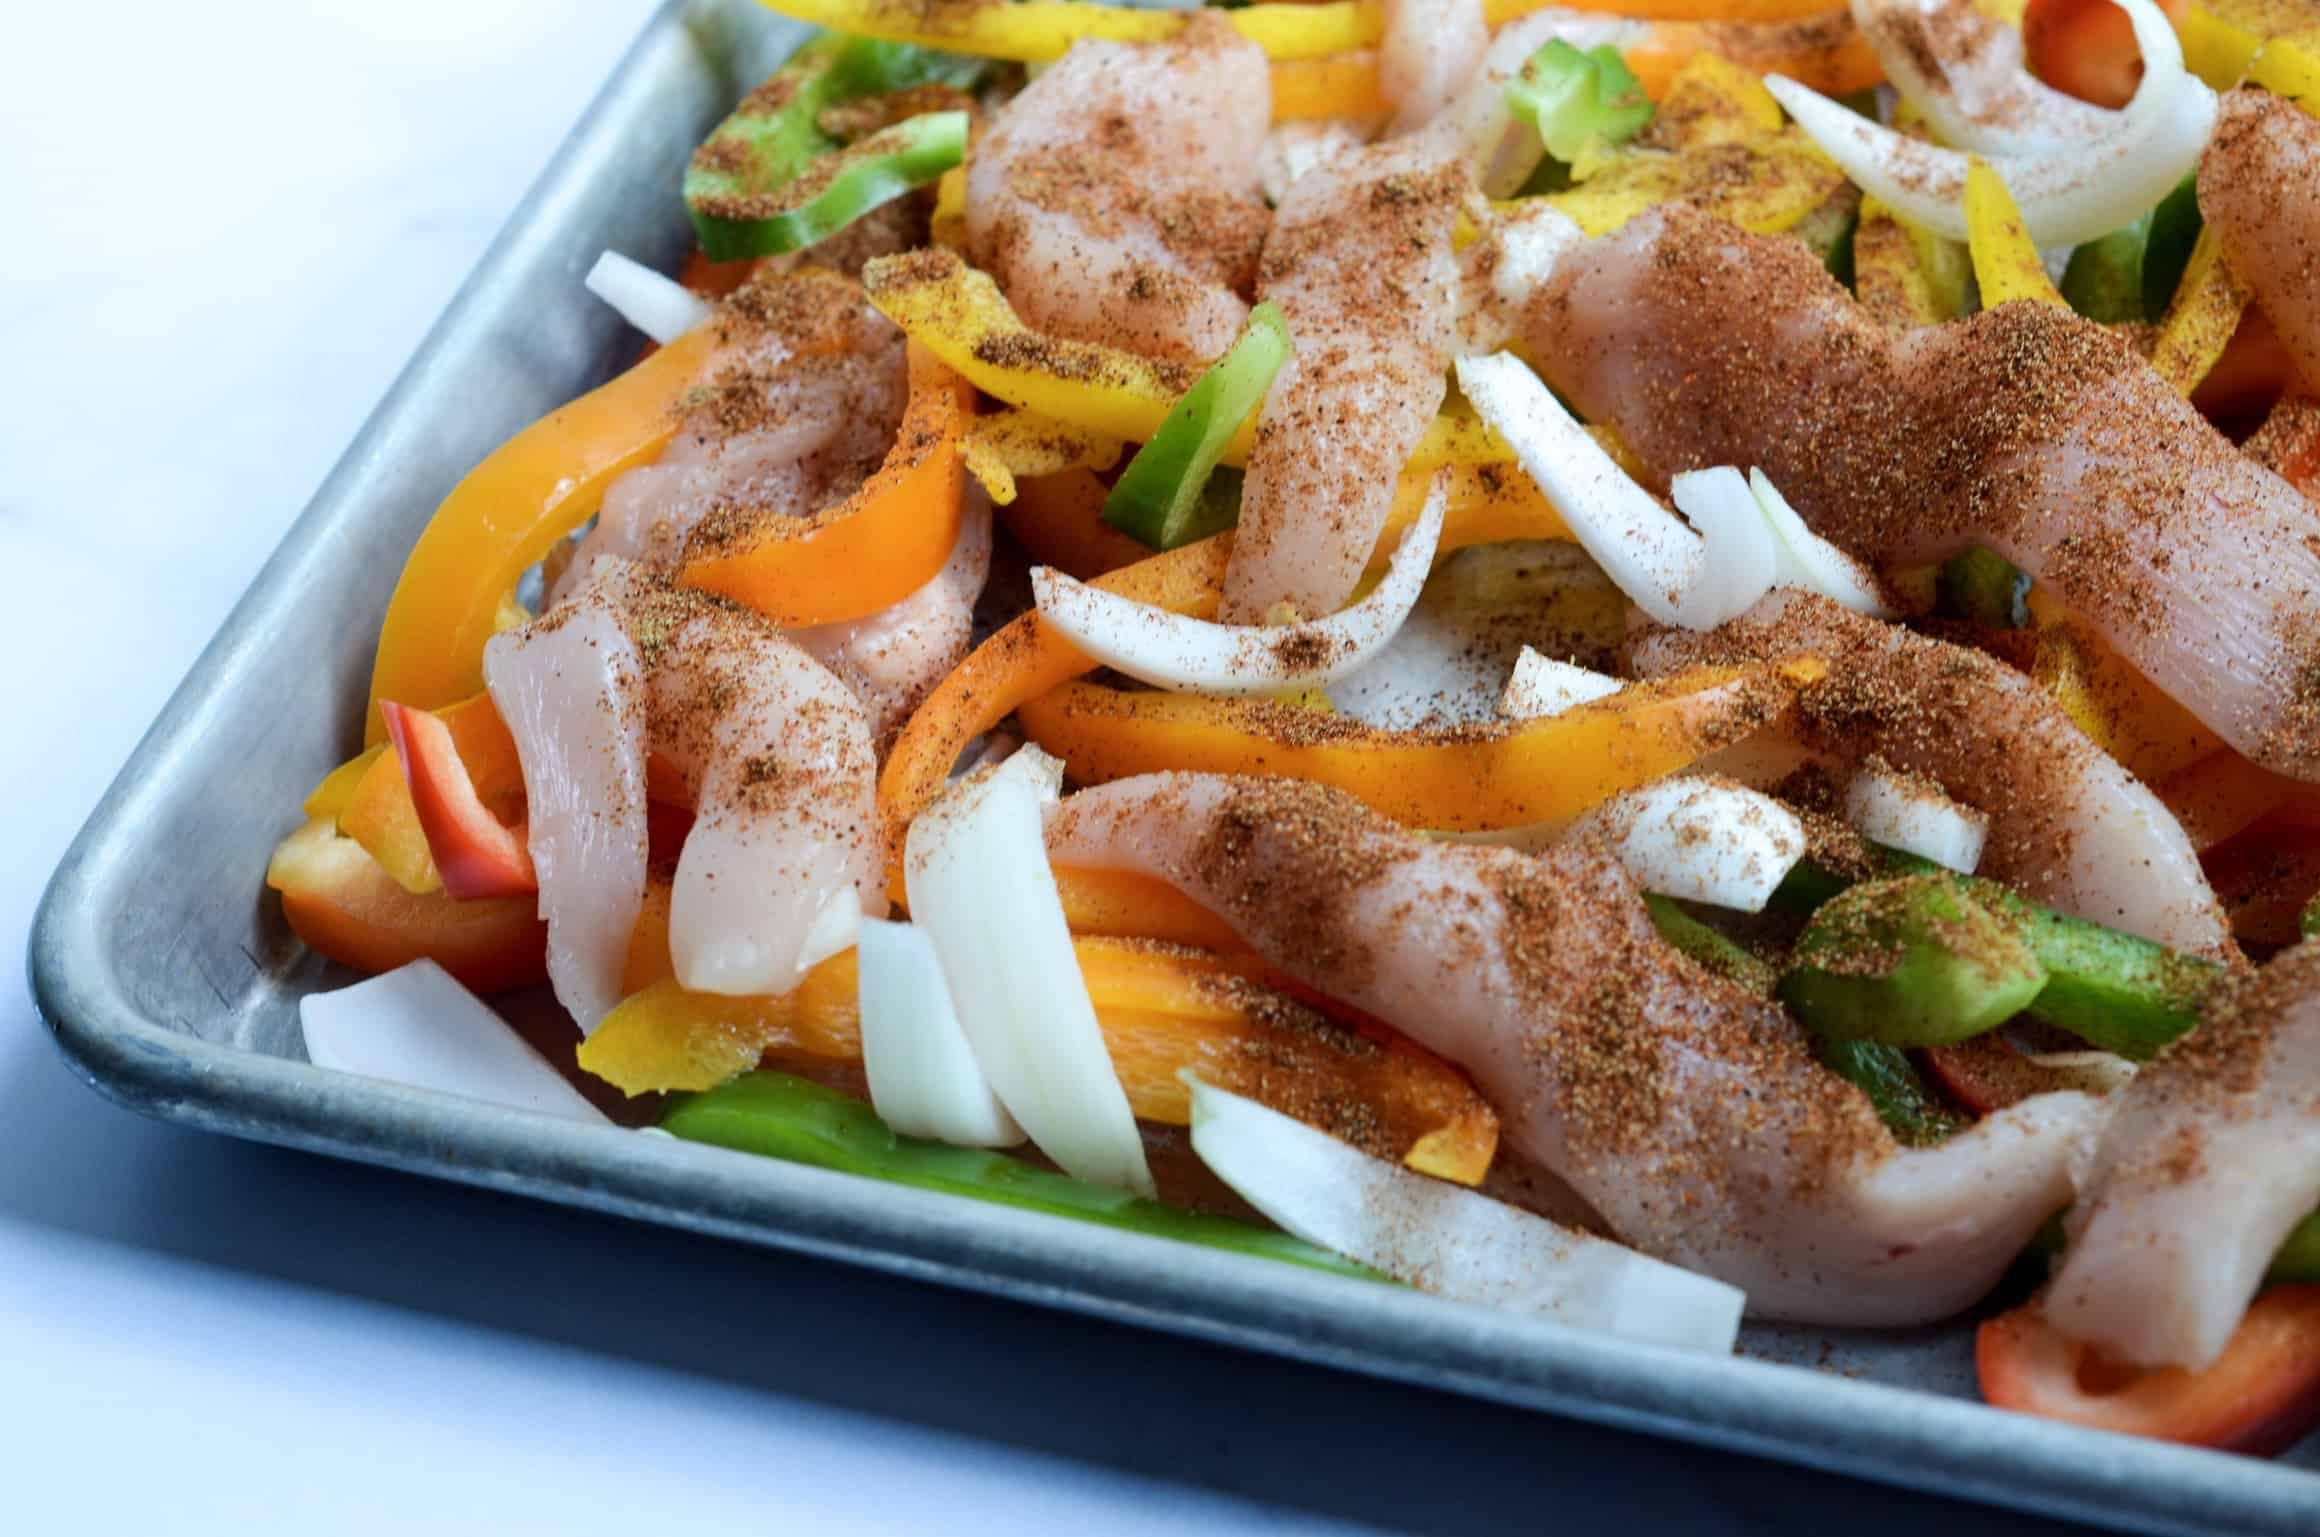 before sheet pan chicken fajitas go into the oven